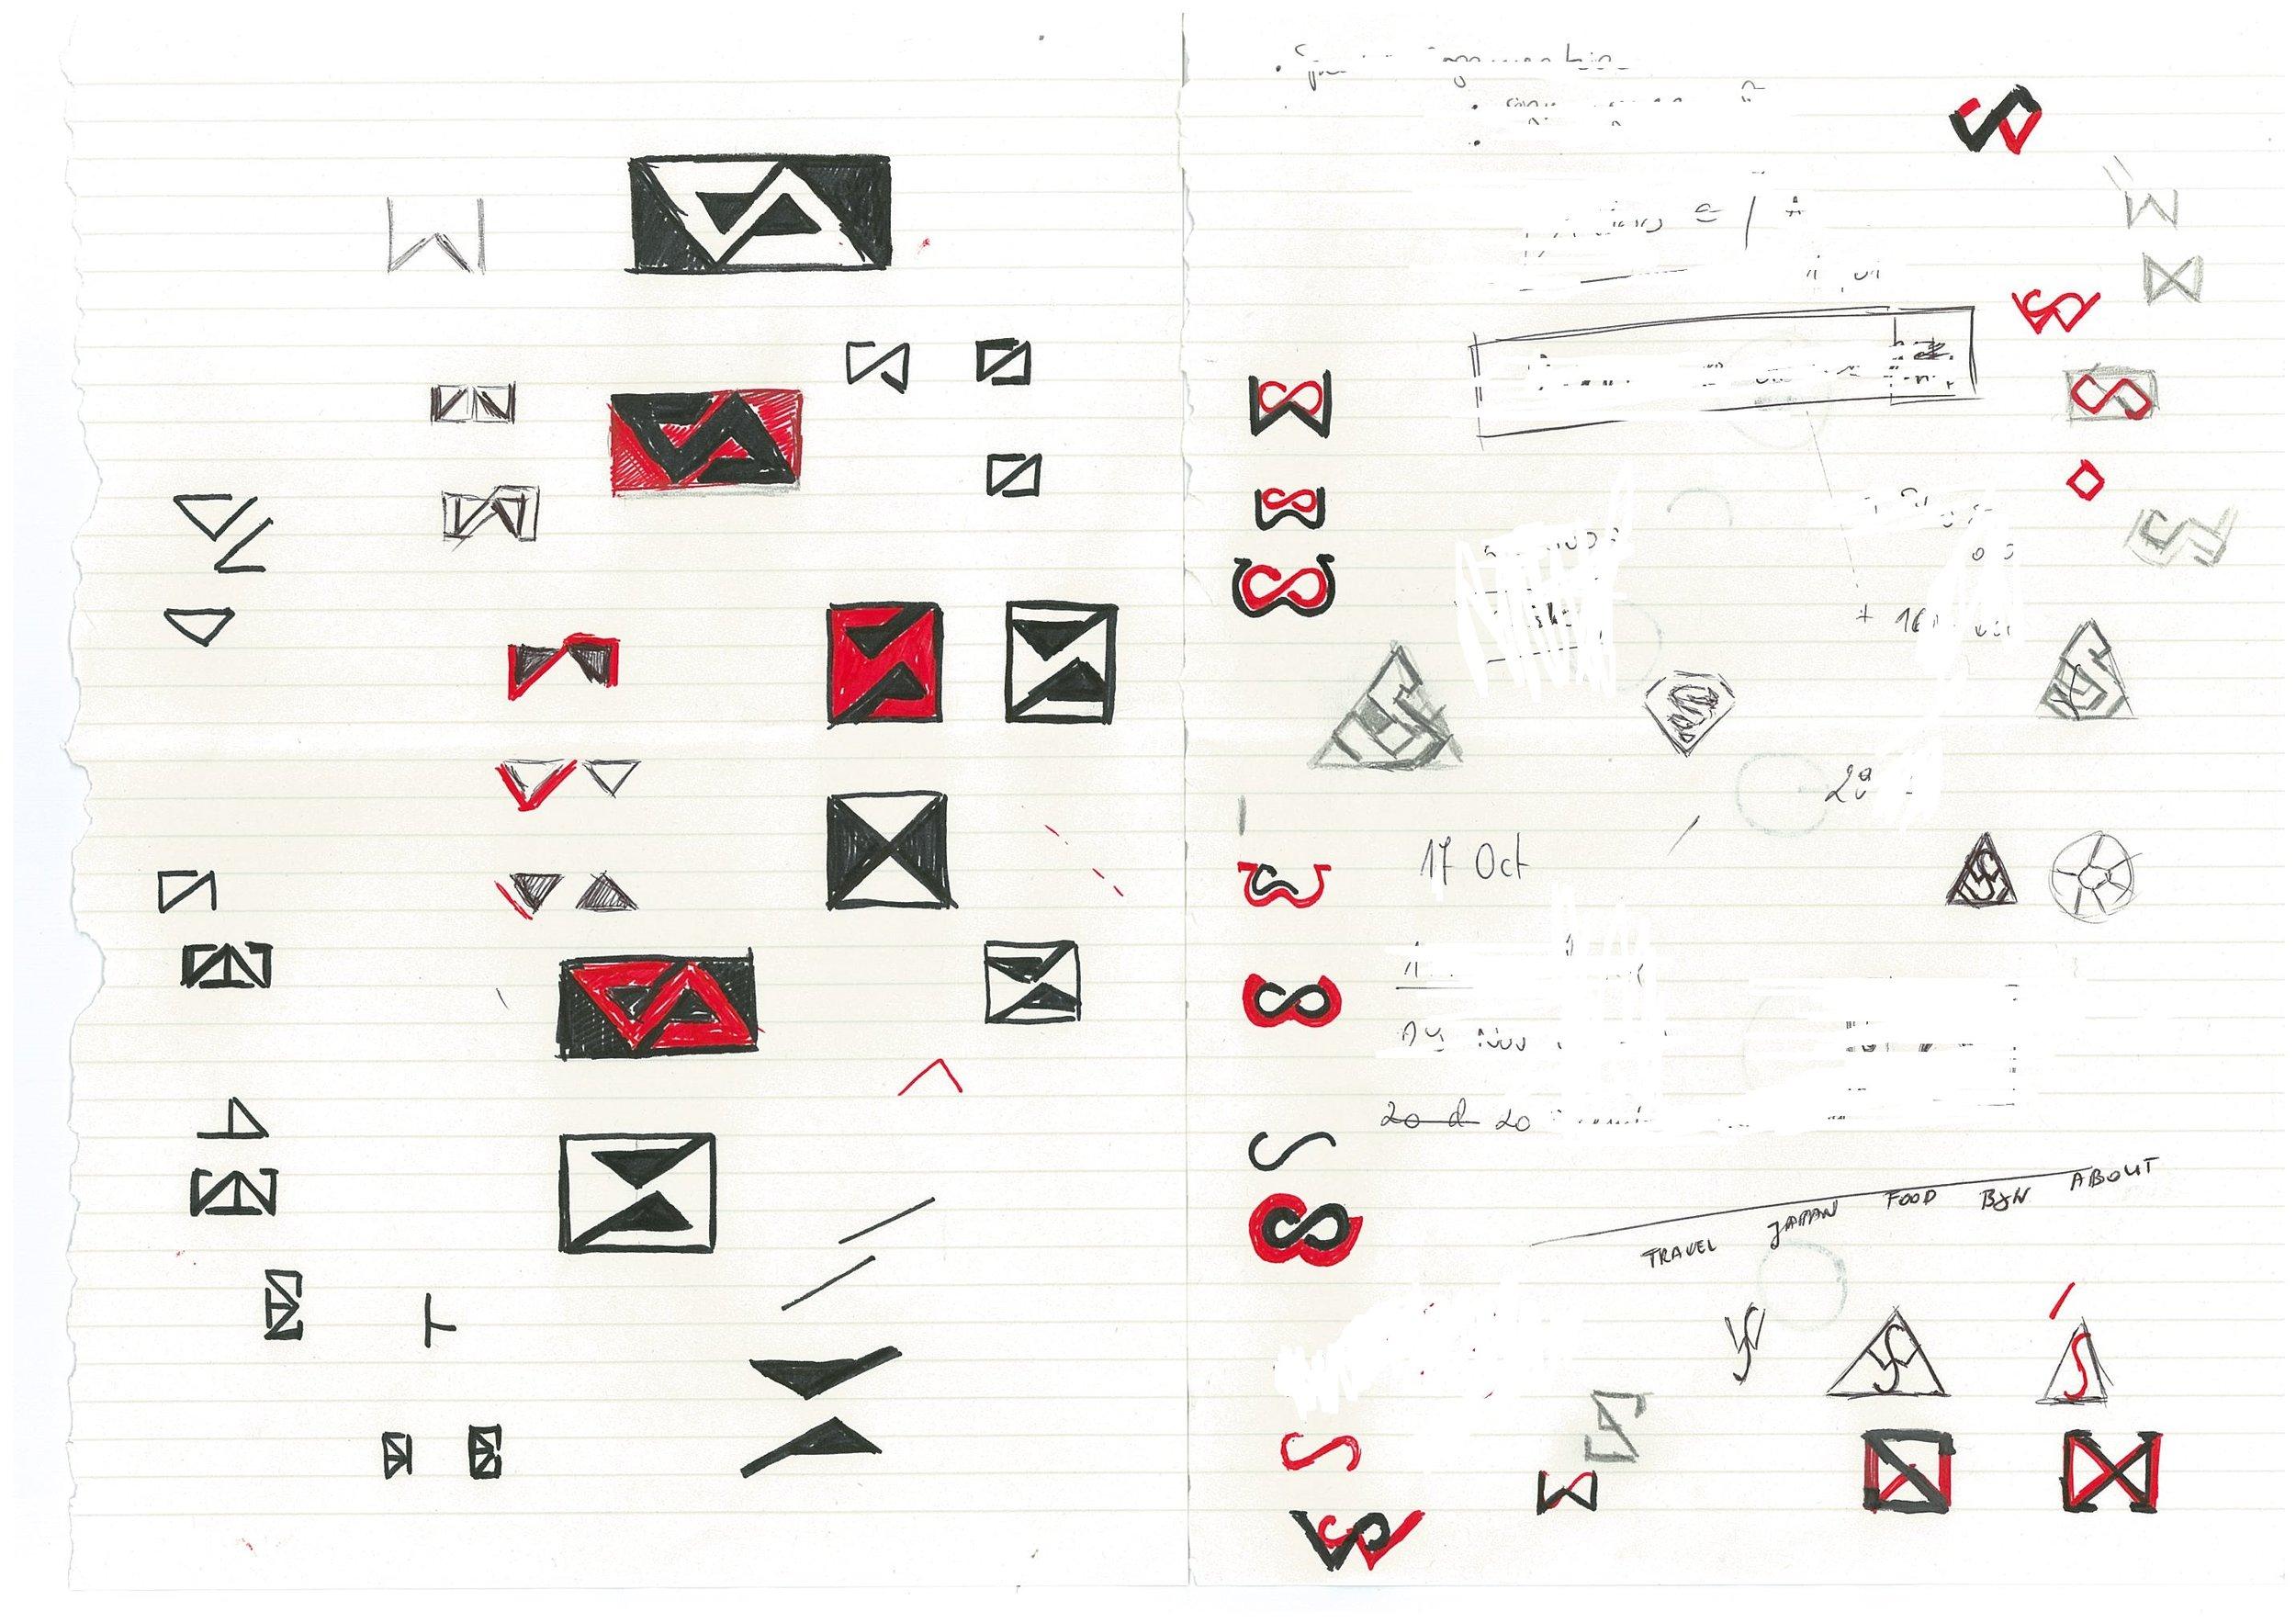 My logo design process - initial ideas